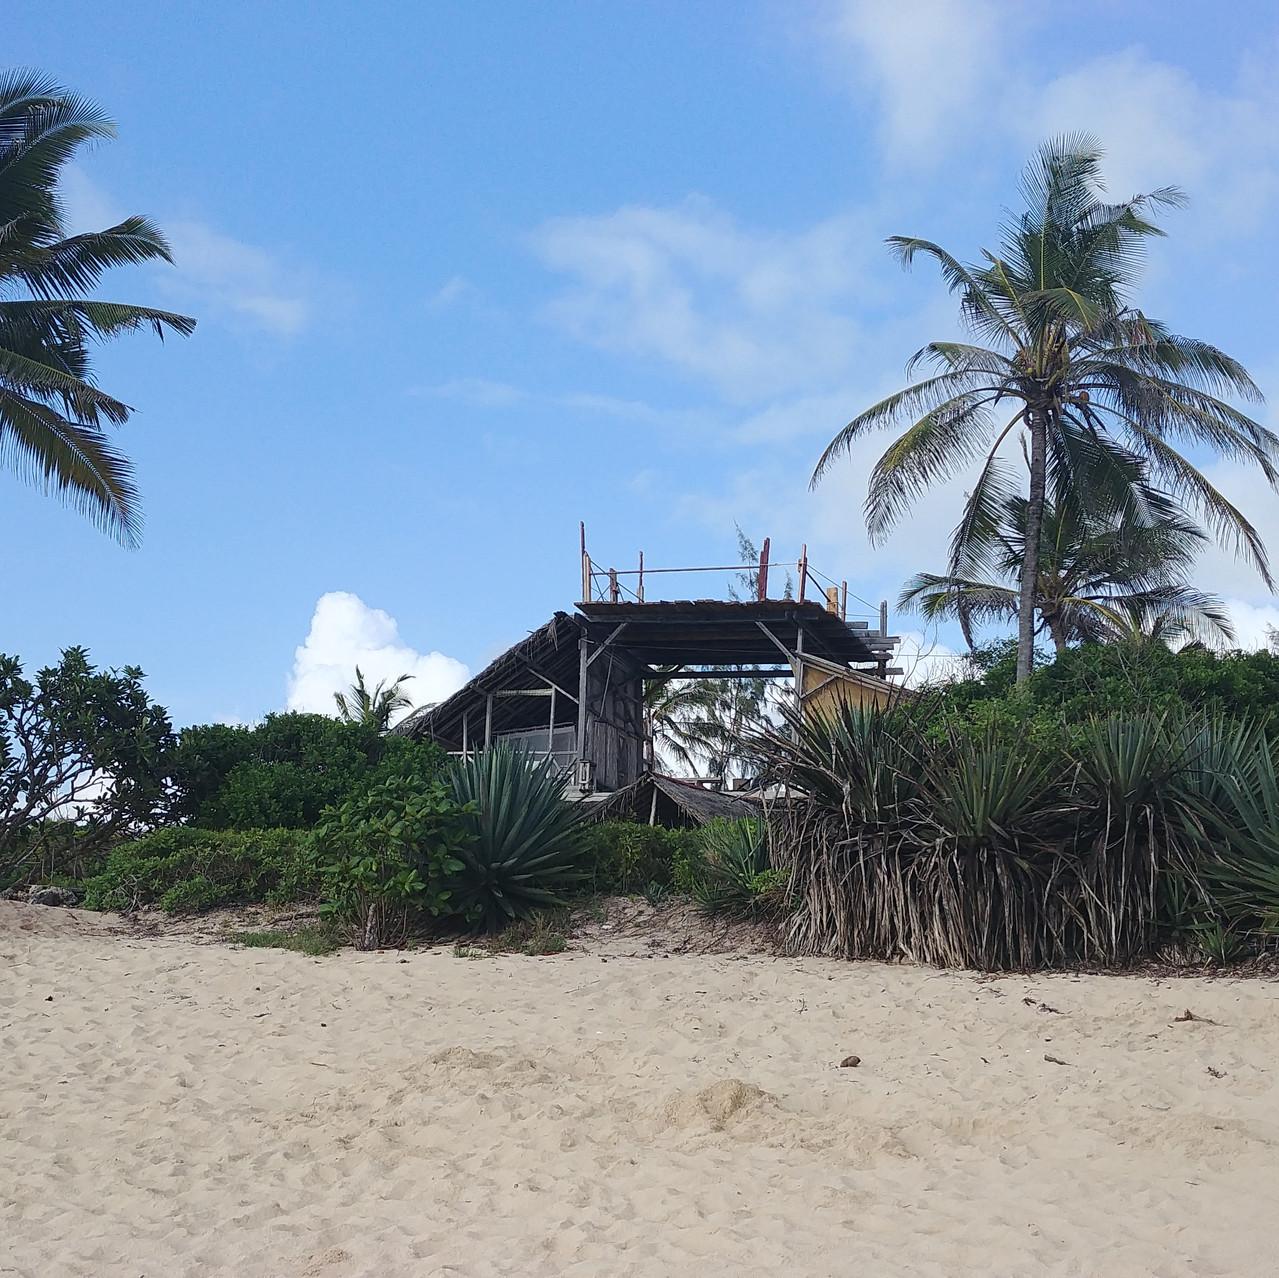 La maison de Robinson Crusoe